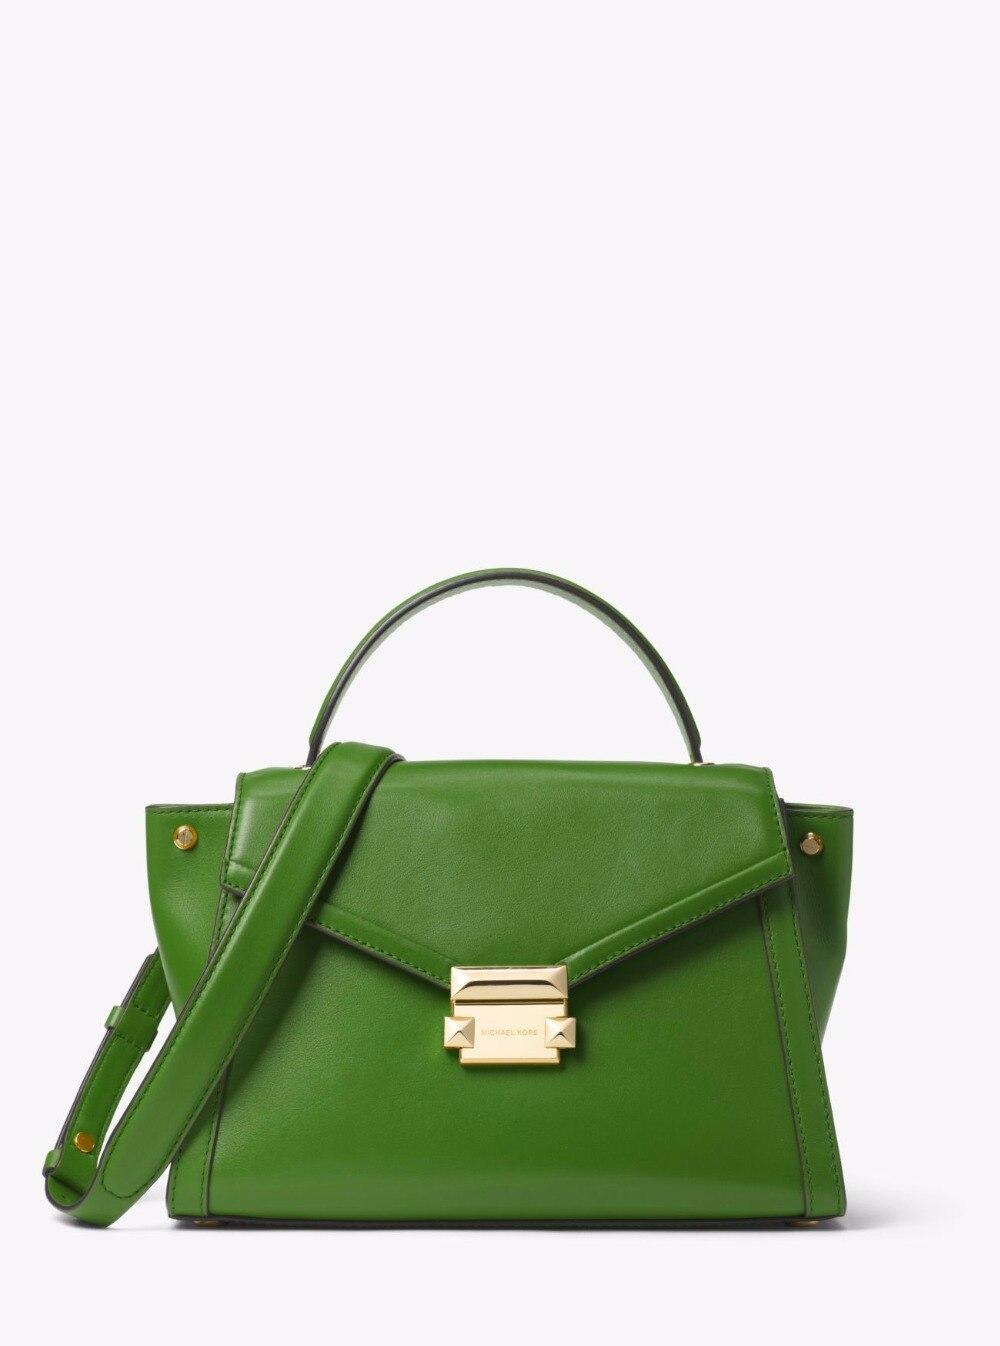 c3c24d0049b8 FSO- Michael kors Official MK Women shoulder Bag Fashion Women ...